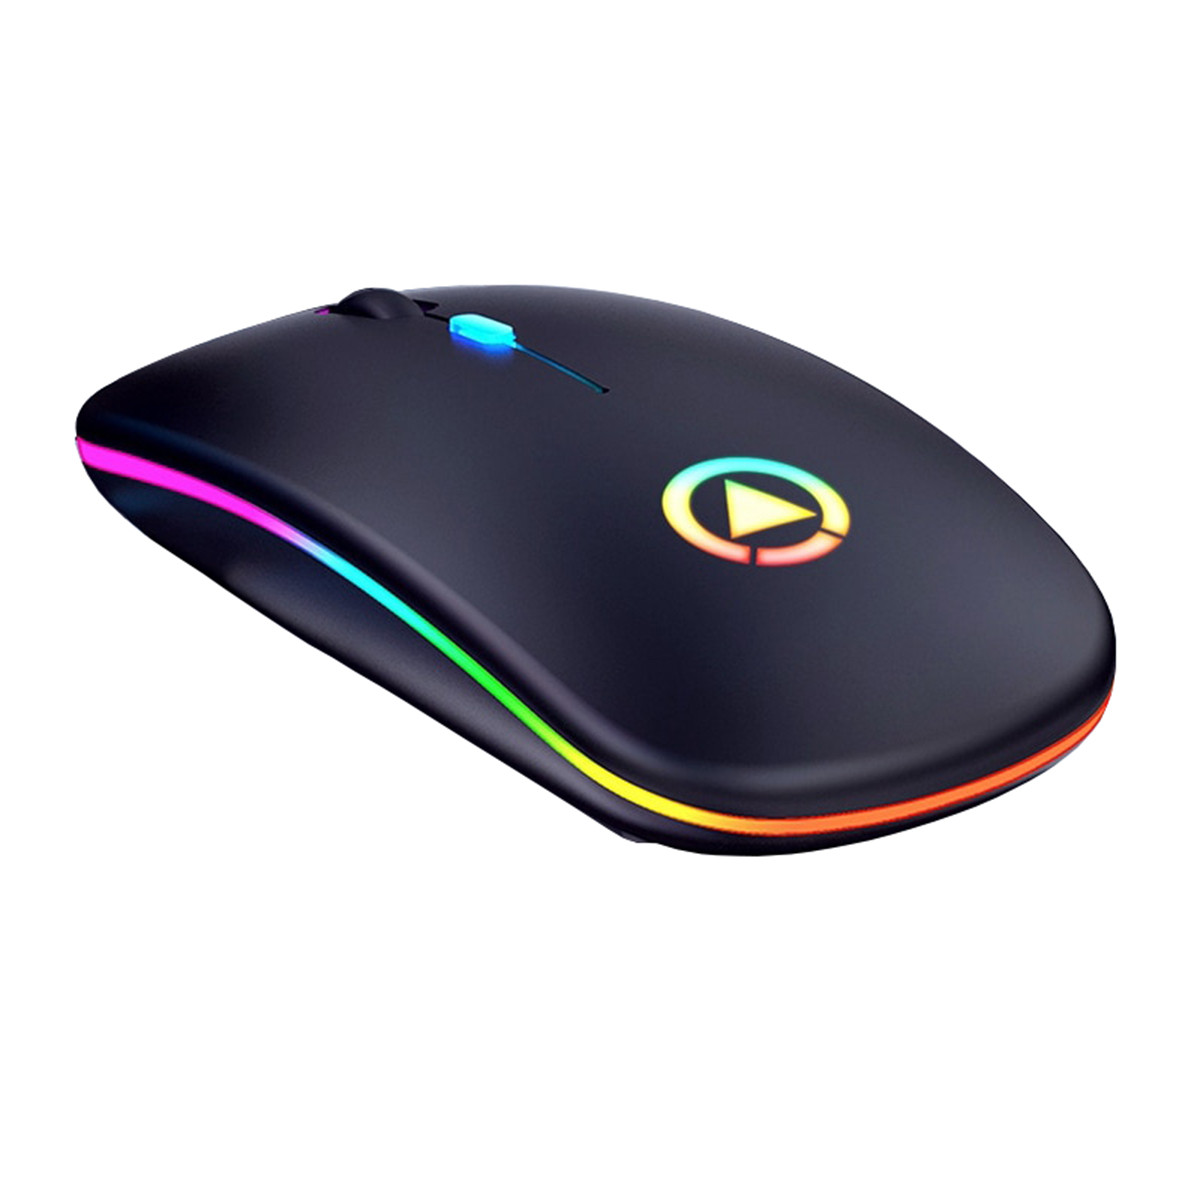 Мышь беспроводная SKY (A2-BT) Black, аккумулятор, Bluetooth, RGB